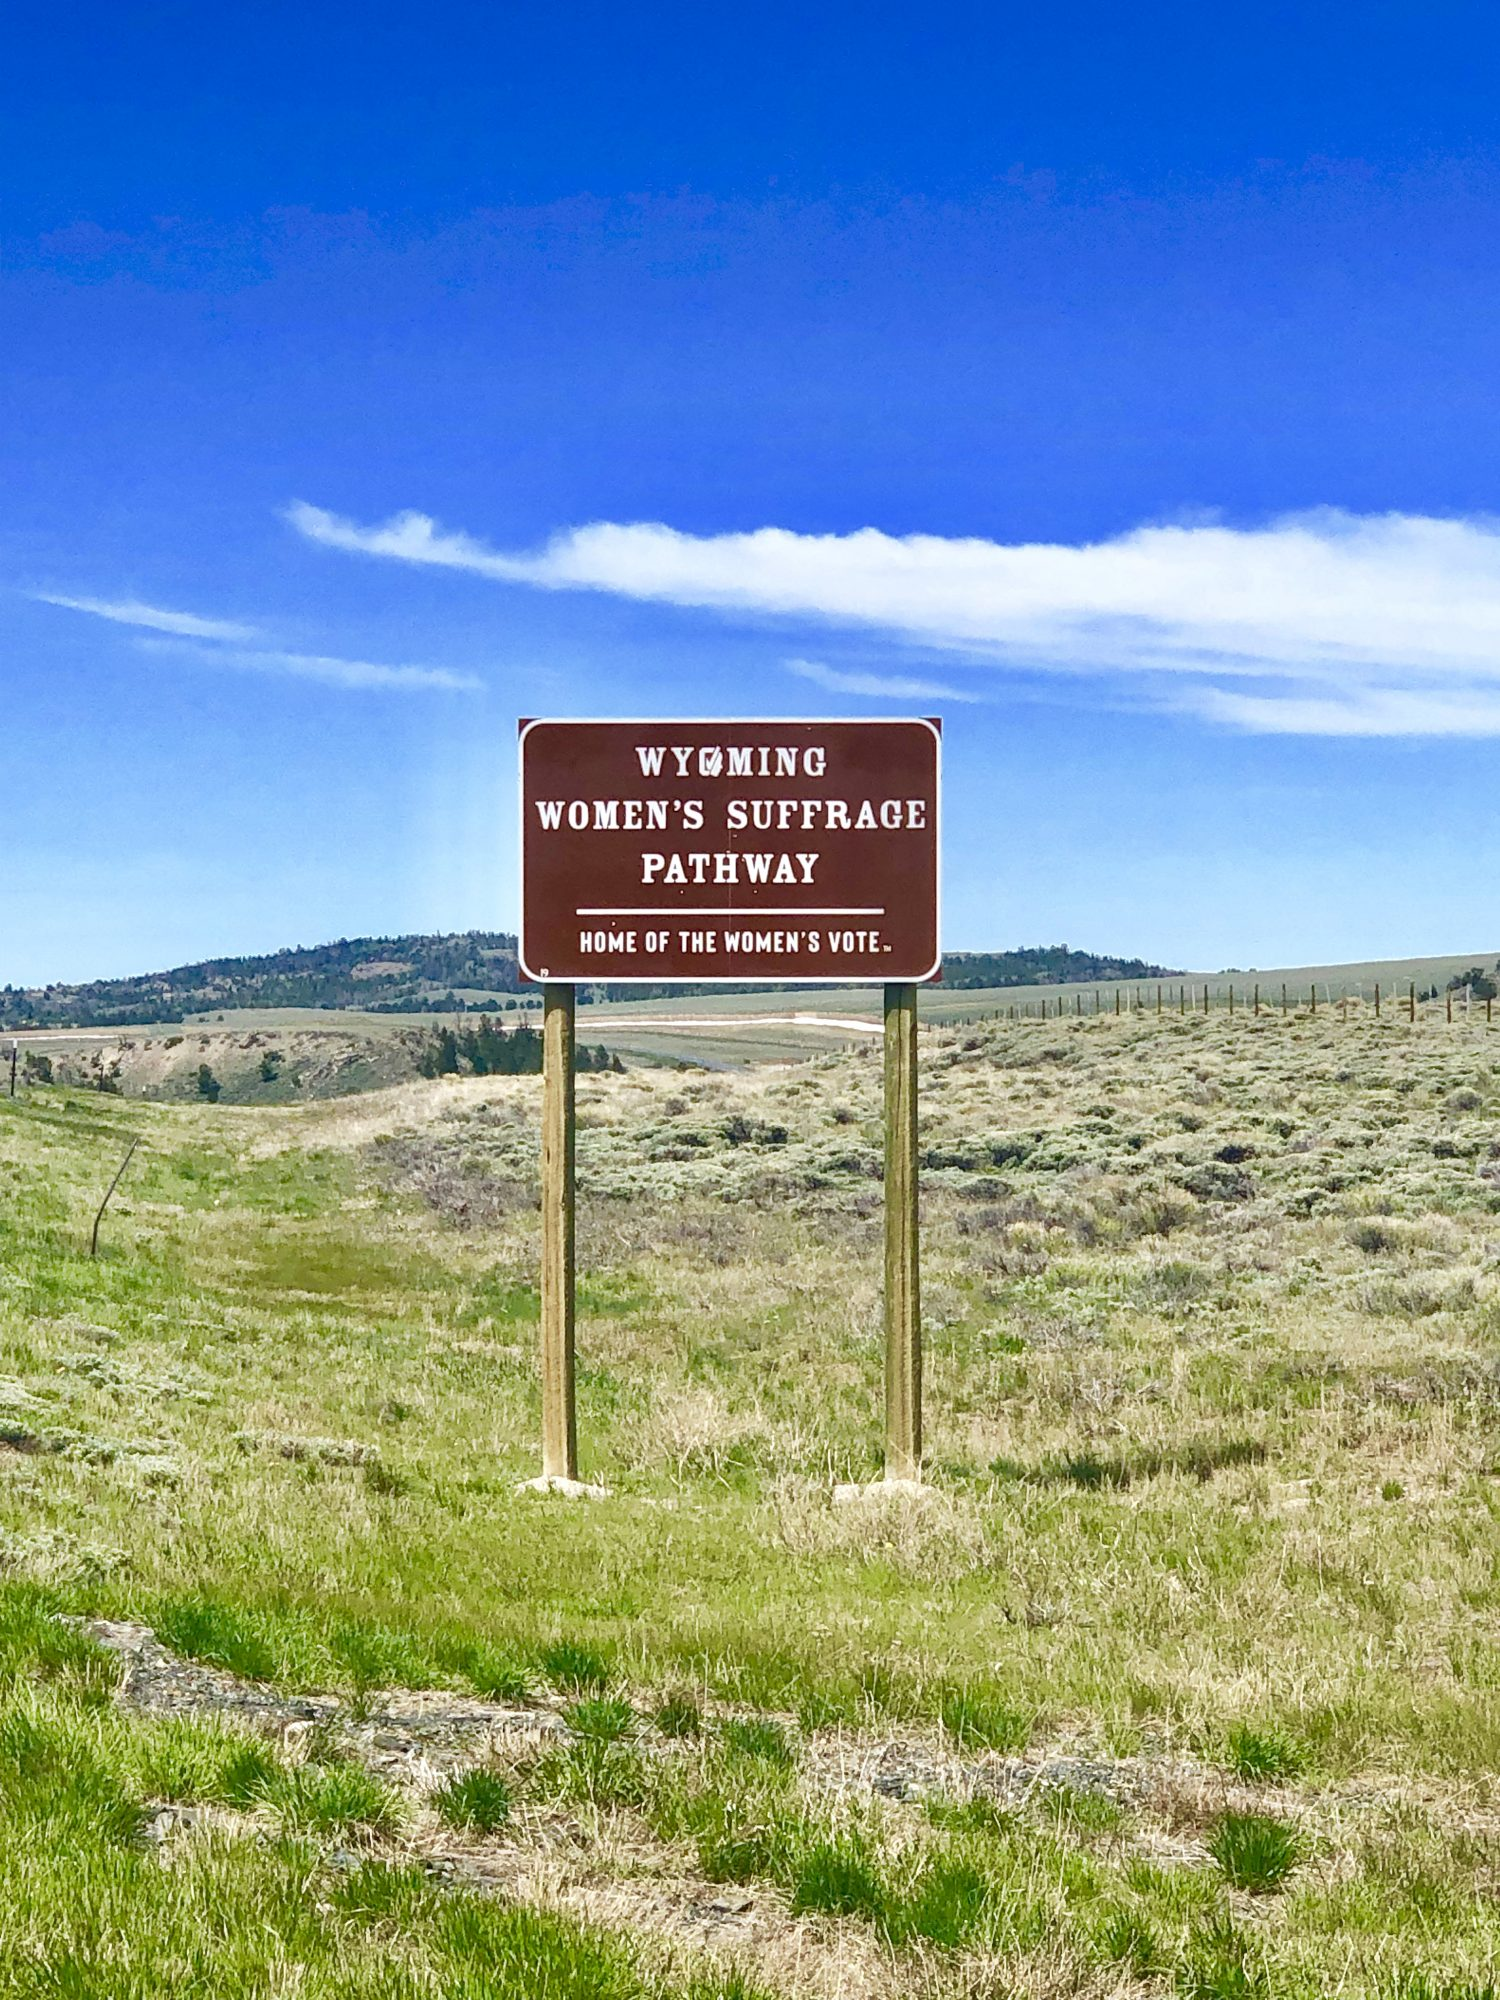 WyomingWomensSuffragePathway.jpg